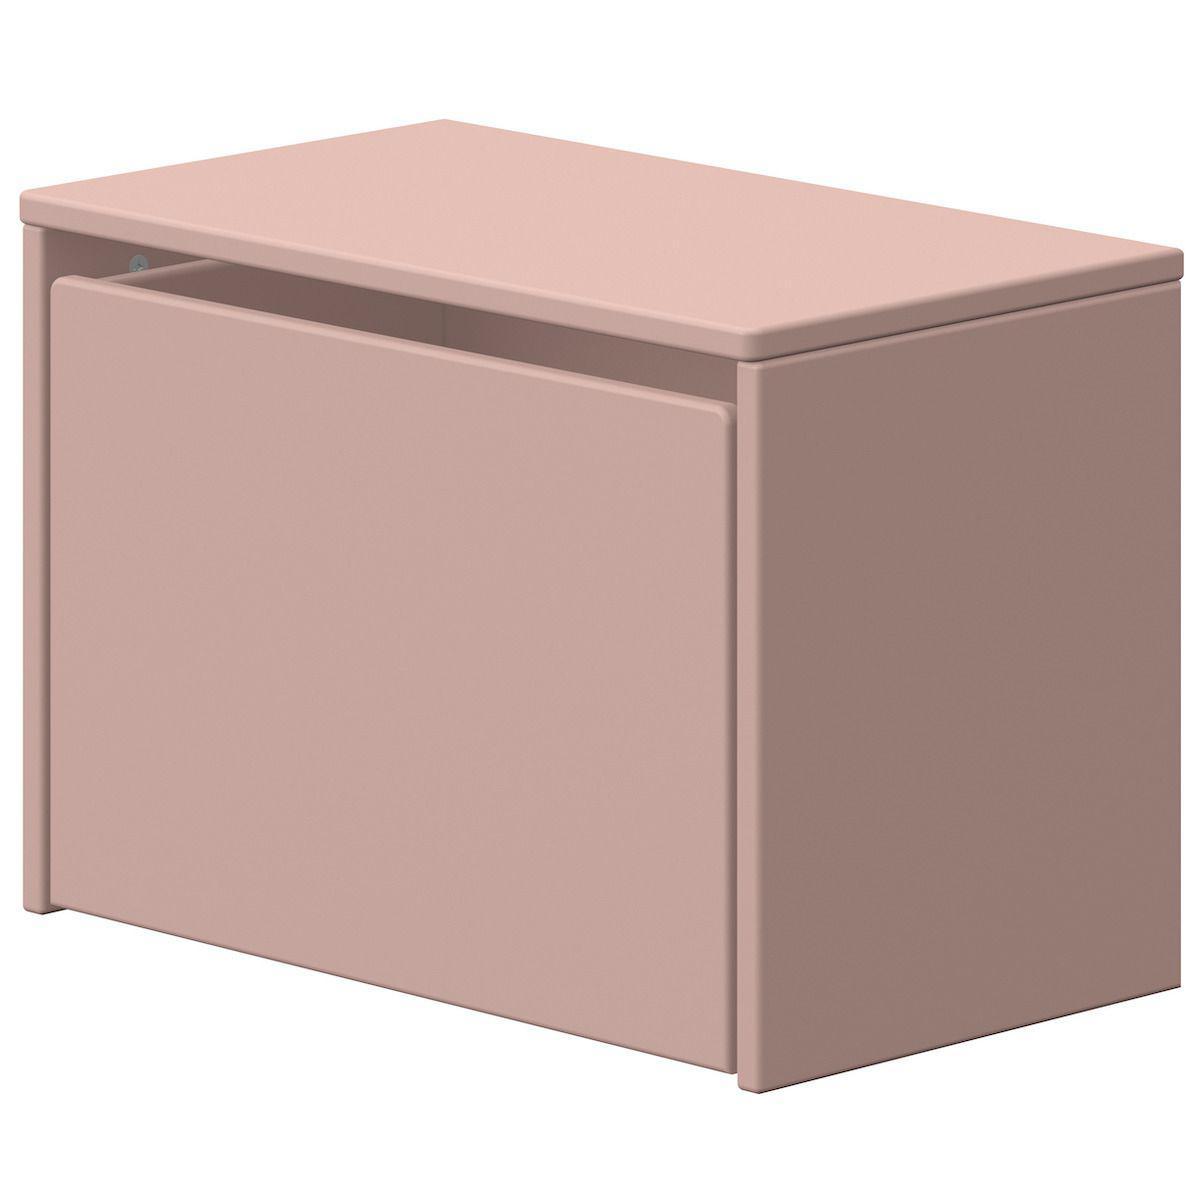 Coffre à jouets PLAY Flexa rose